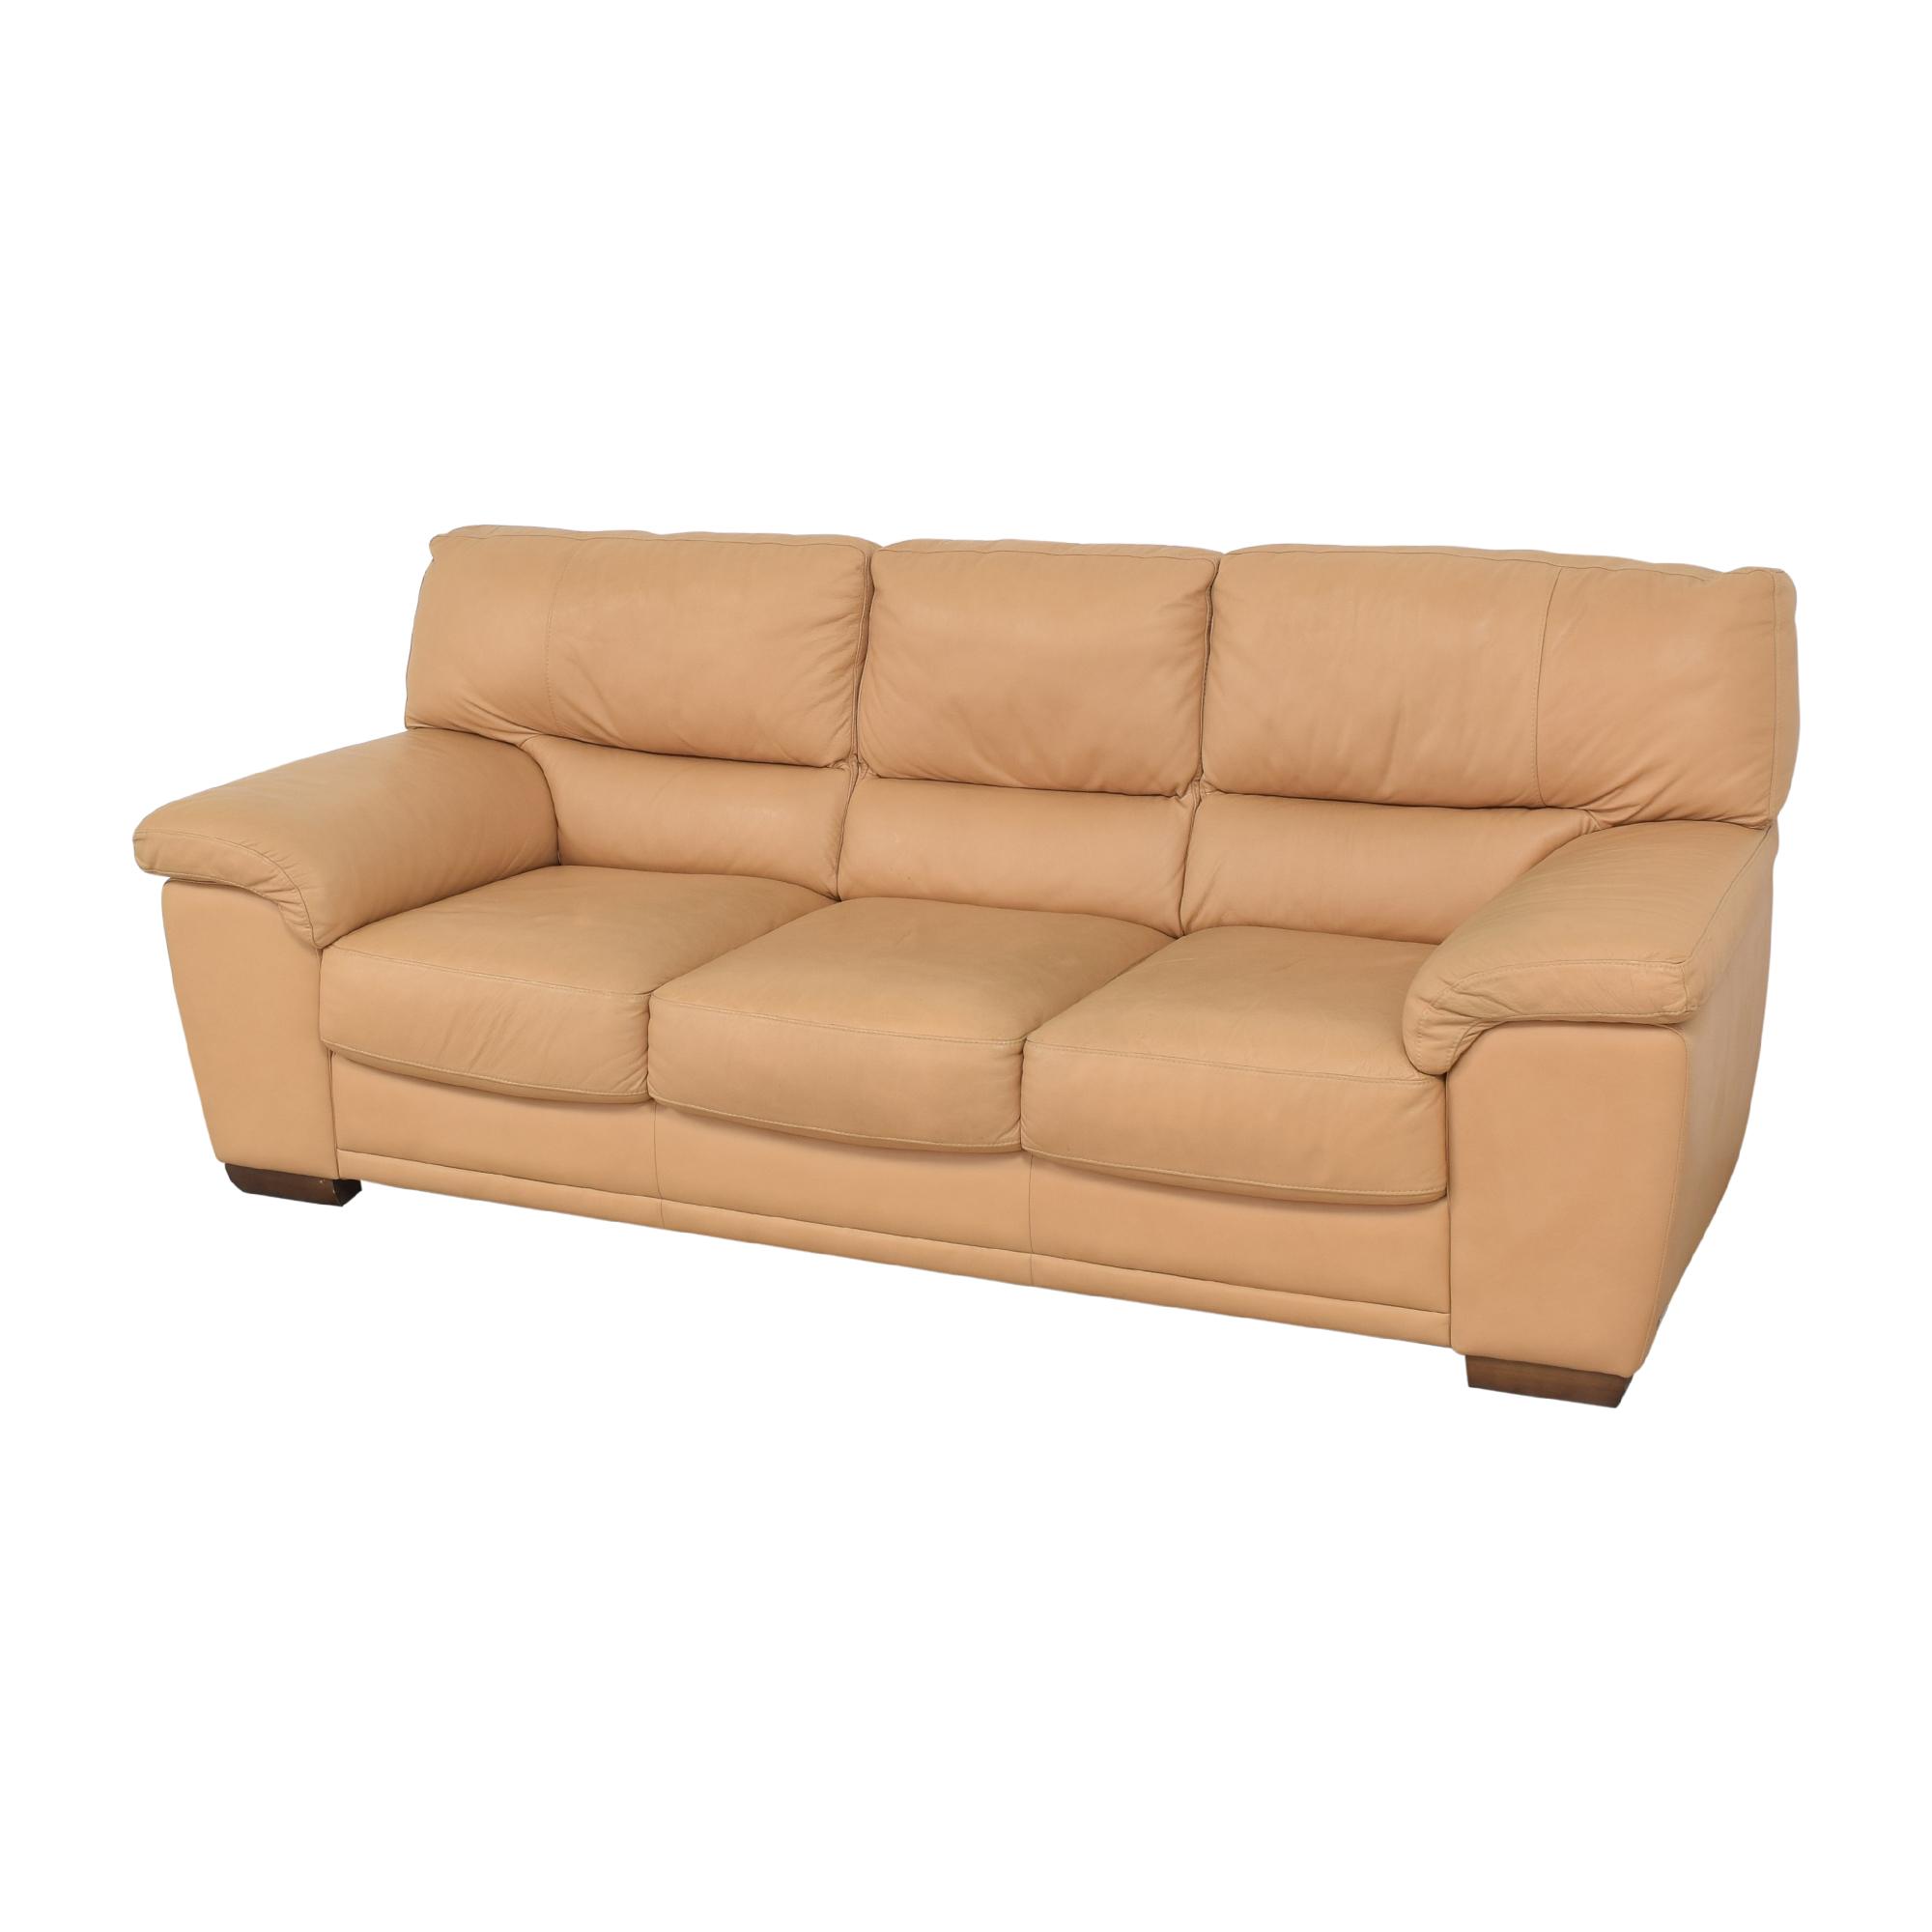 buy Nicoletti Home Nicoletti by JH Hicolty Three Cushion Sofa online